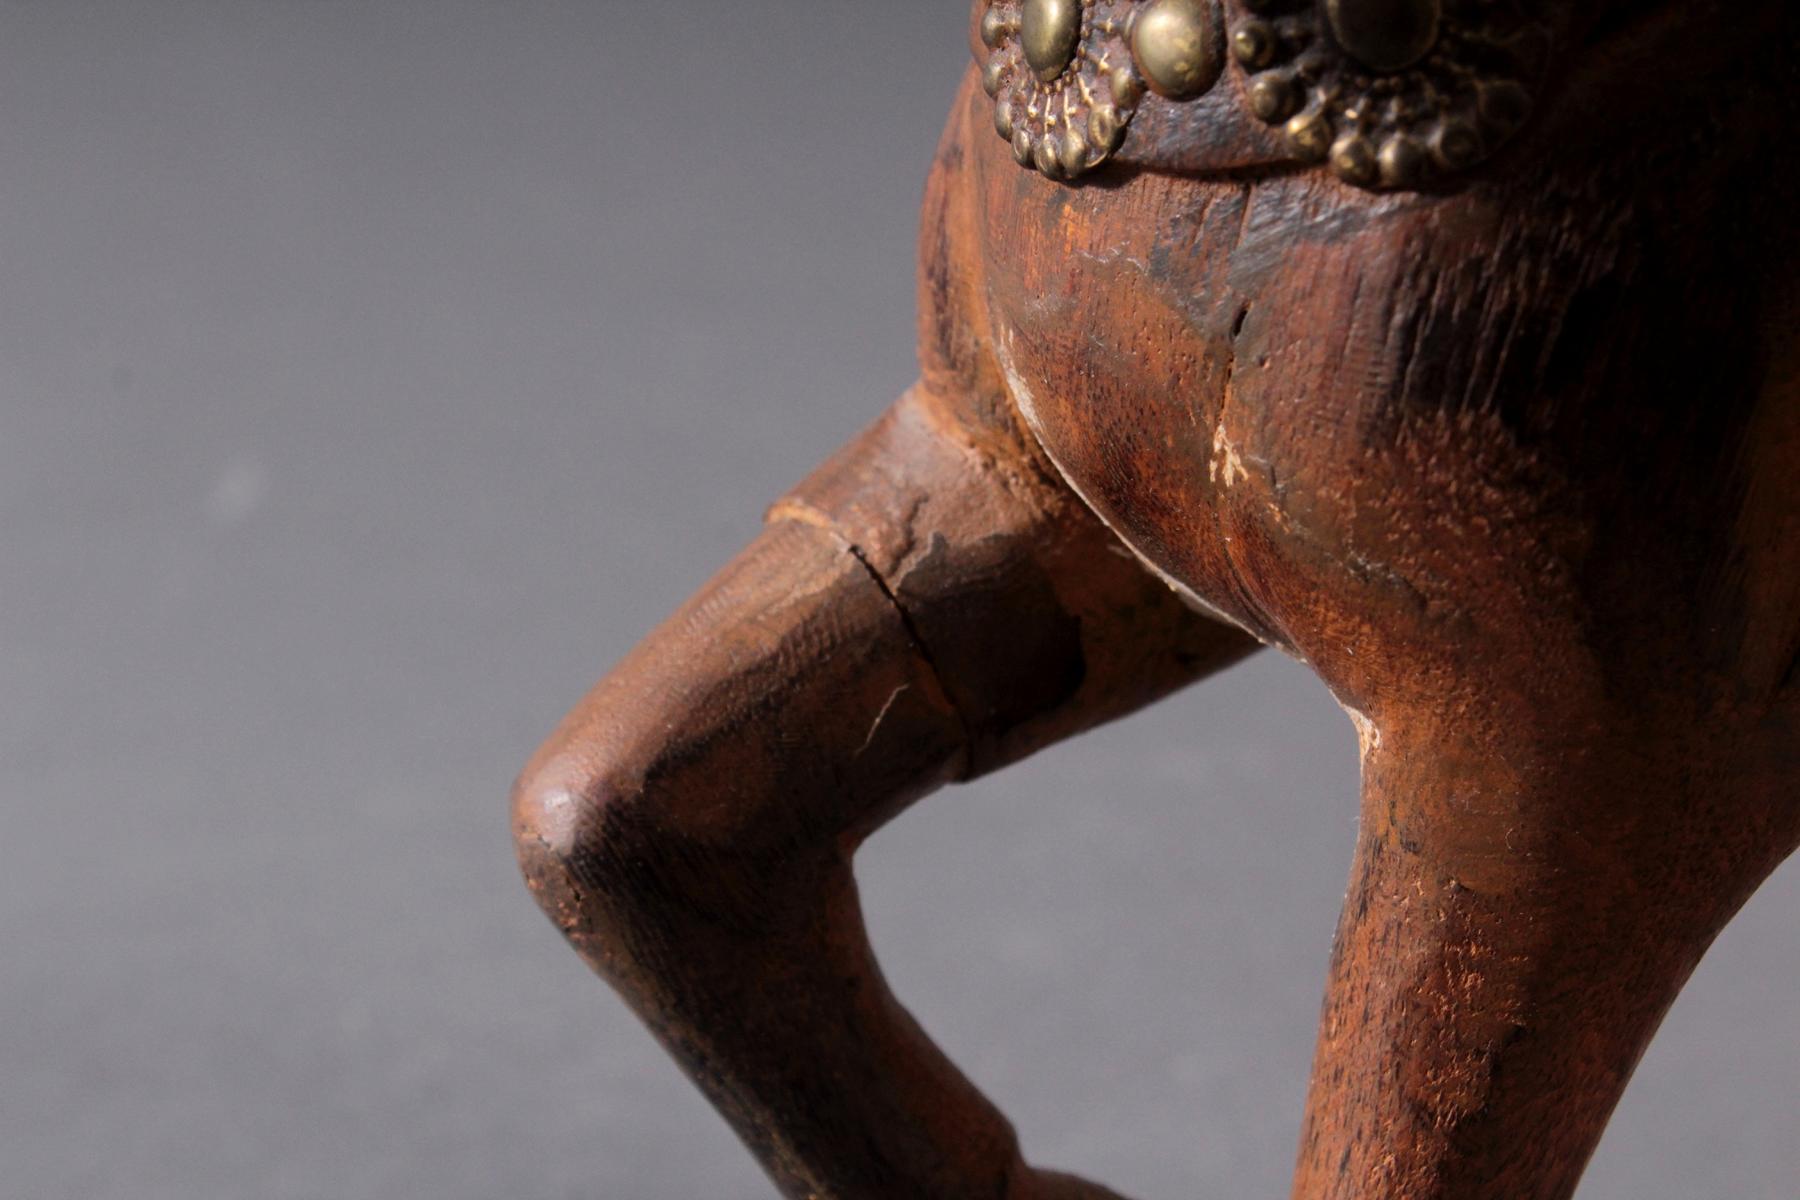 2 Pferdeskulpturen aus Holz 1. Hälfte 20. Jh.-7